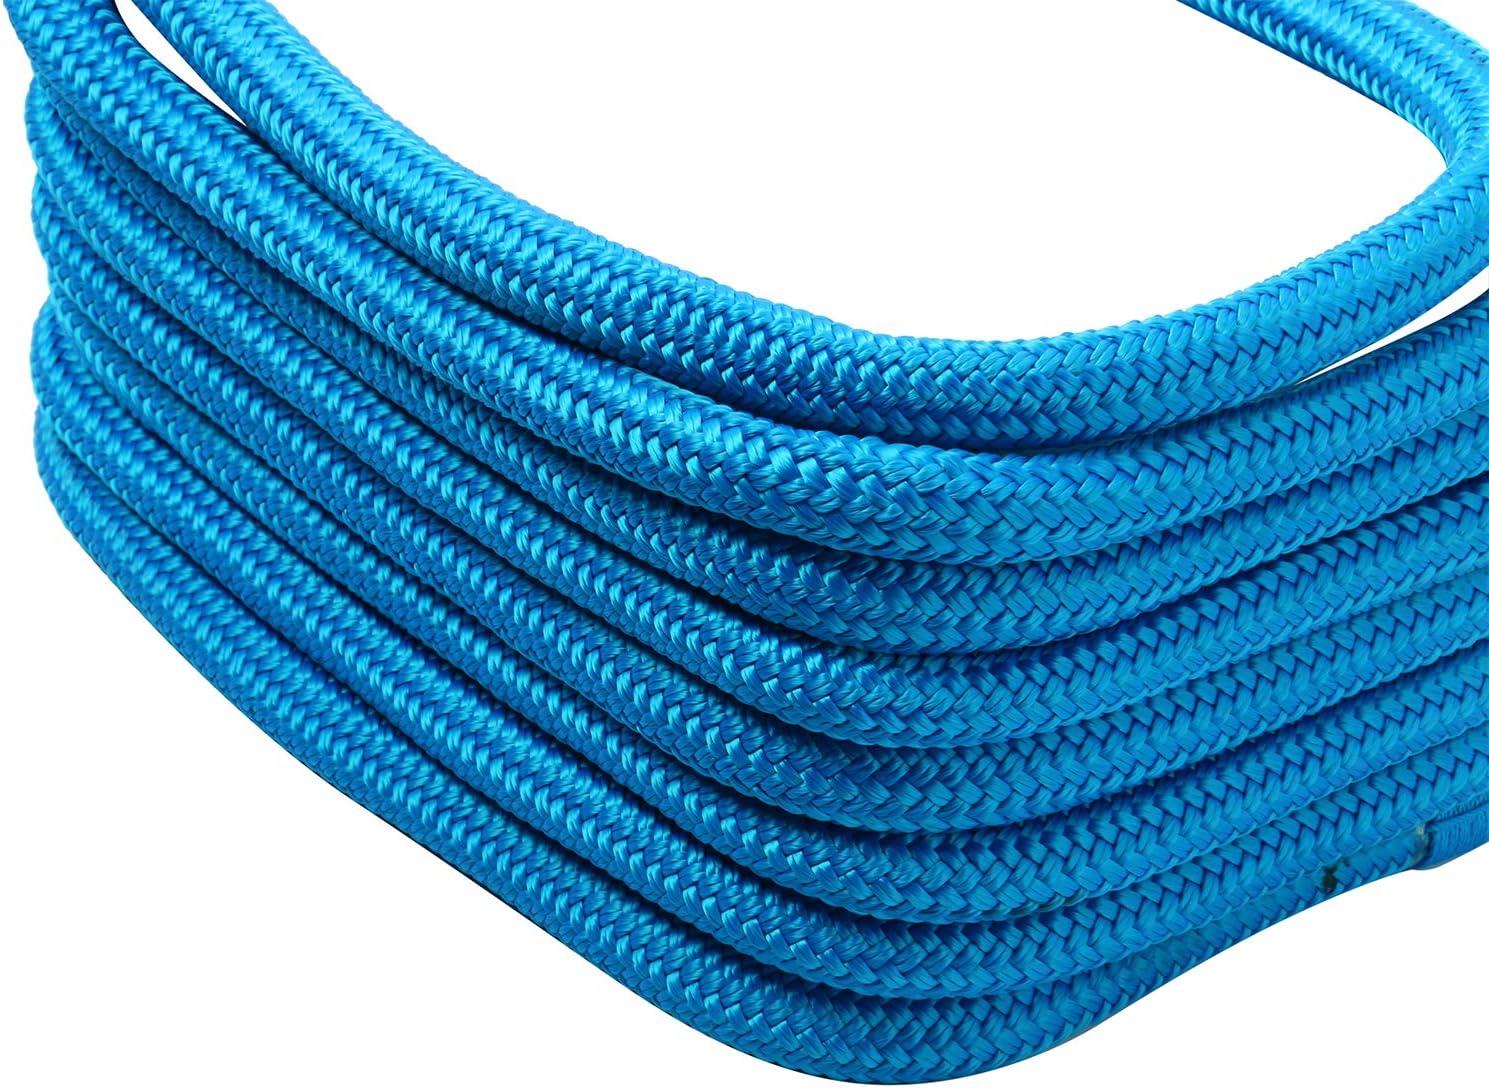 "NovelBee 2 Pack of 5//8/""x 30/' Double Braid Nylon Dockline,Mooring Rope Dock Line,Working Load Limit 1540 lbs,Breaking Strength 7,700 lbs"